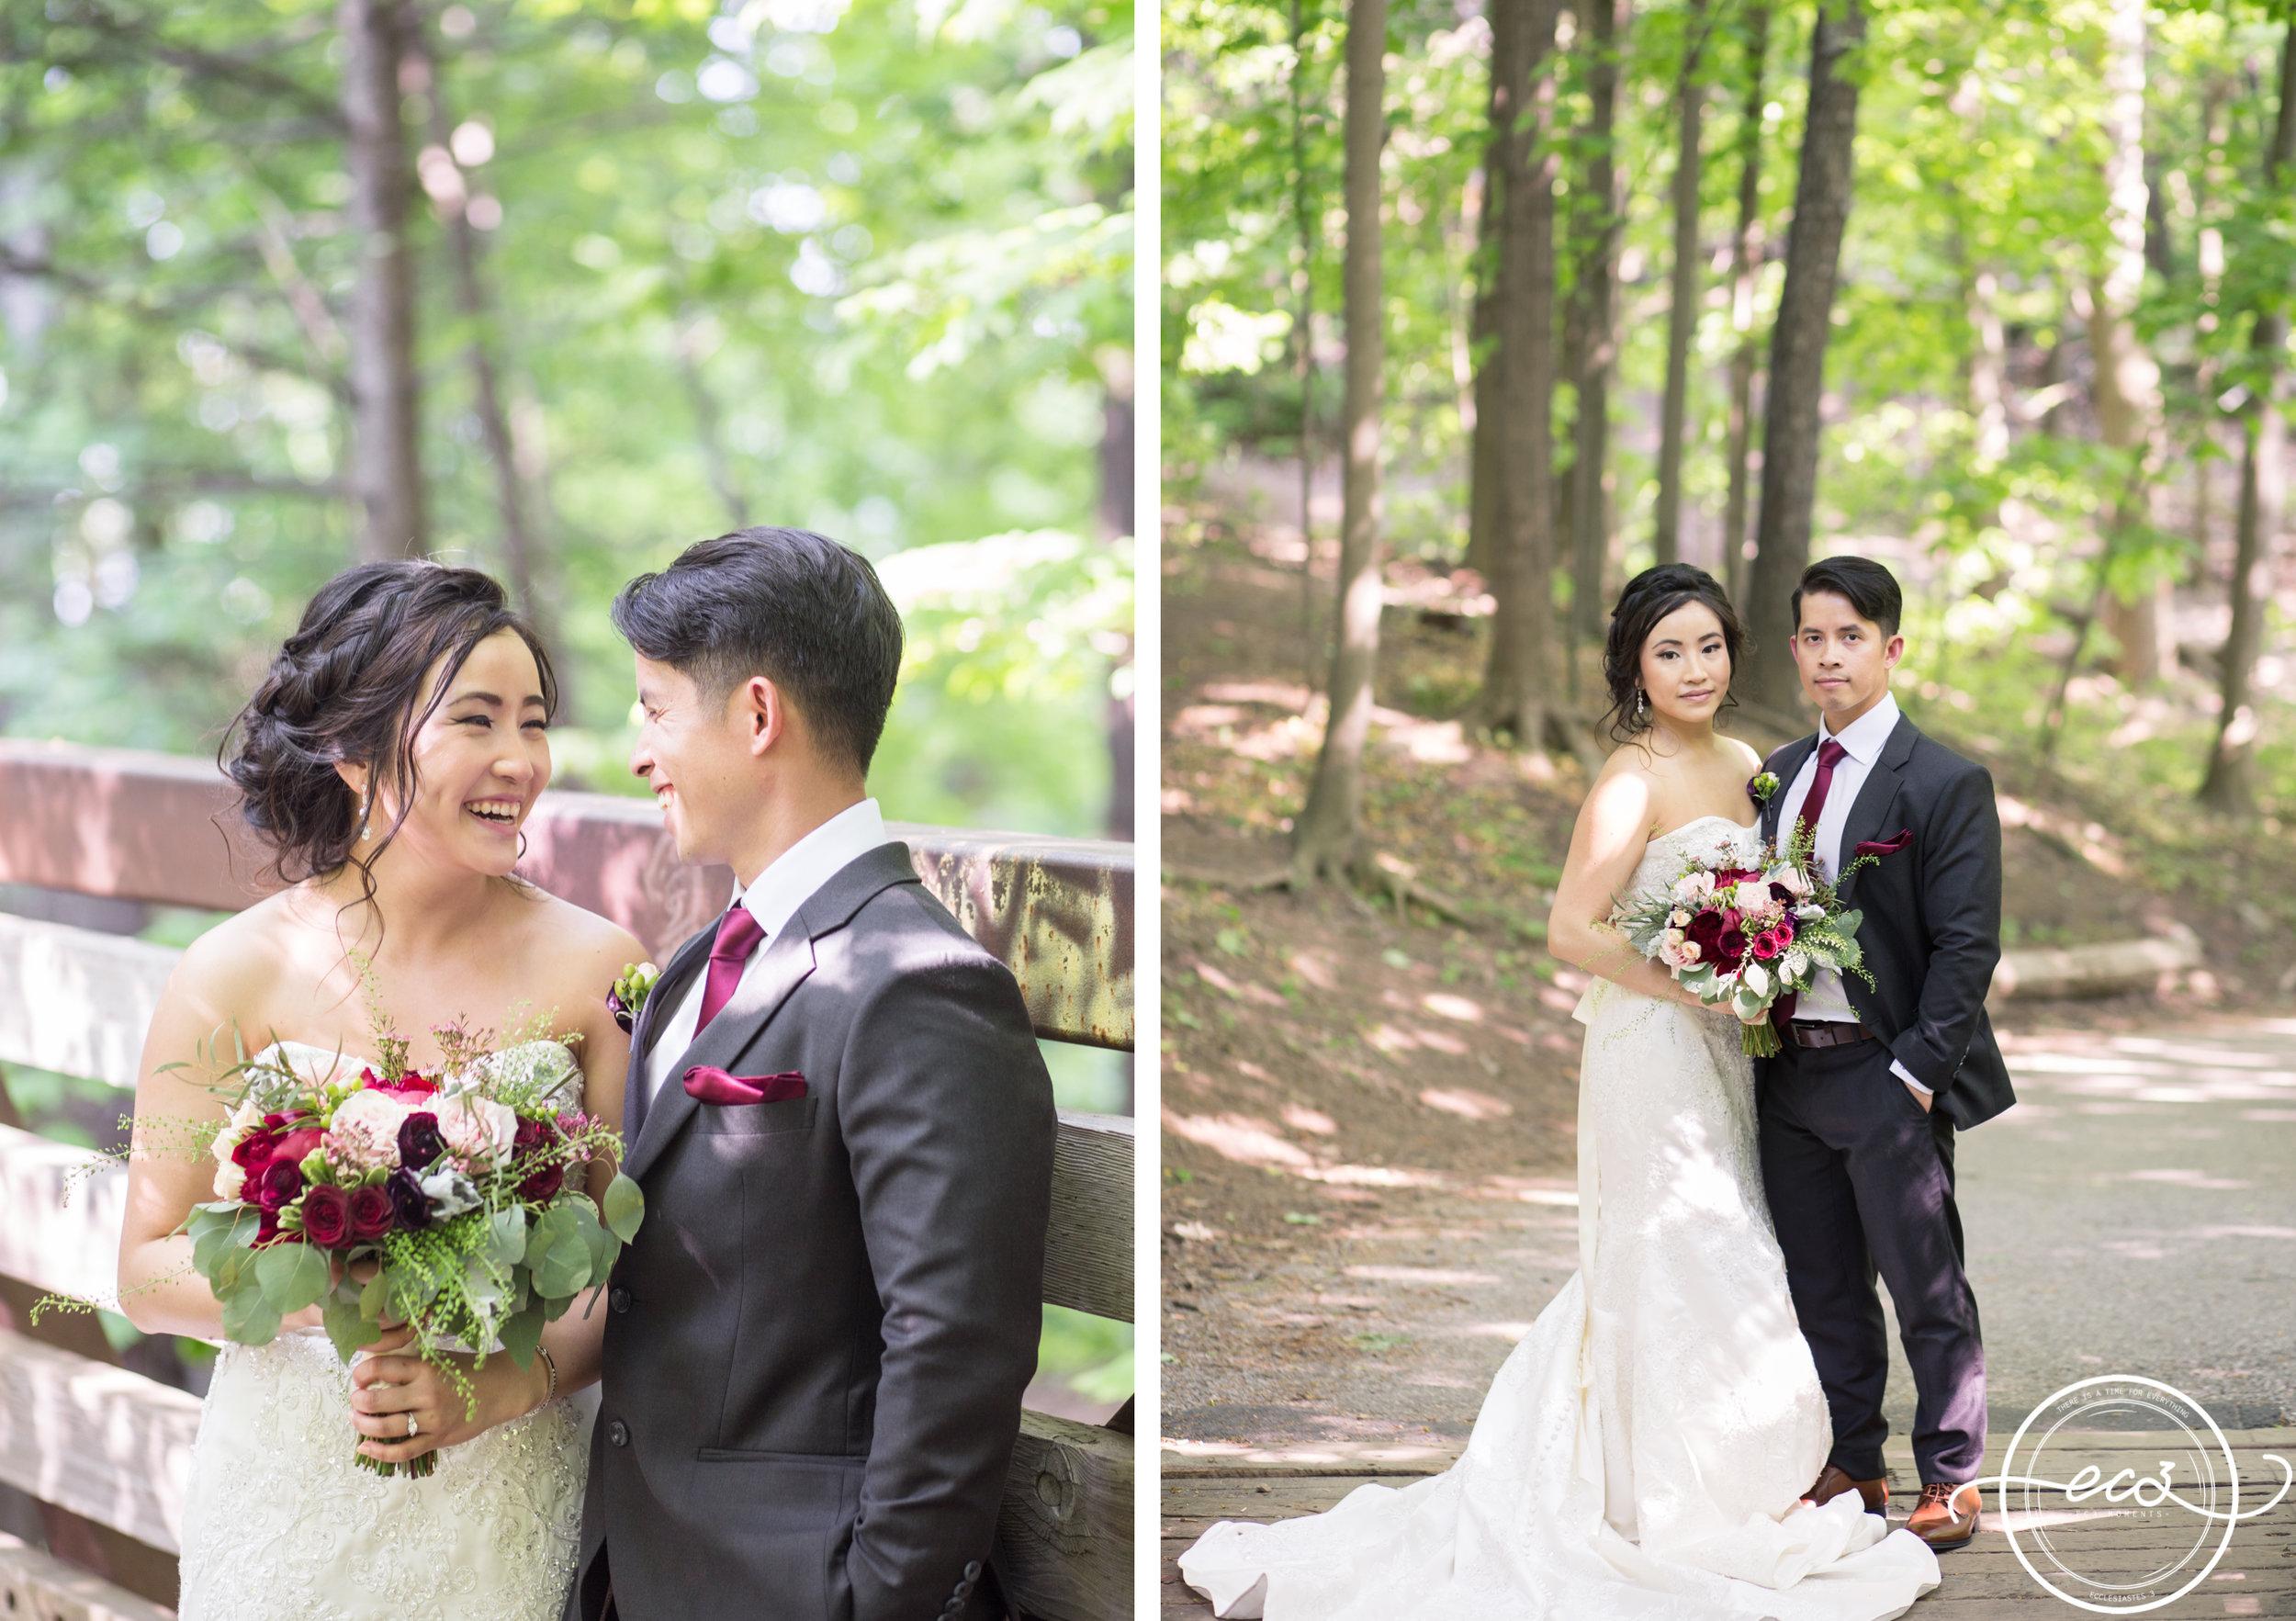 Toronto Edwards Garden and Intimate Vietnamese Wedding23.jpg